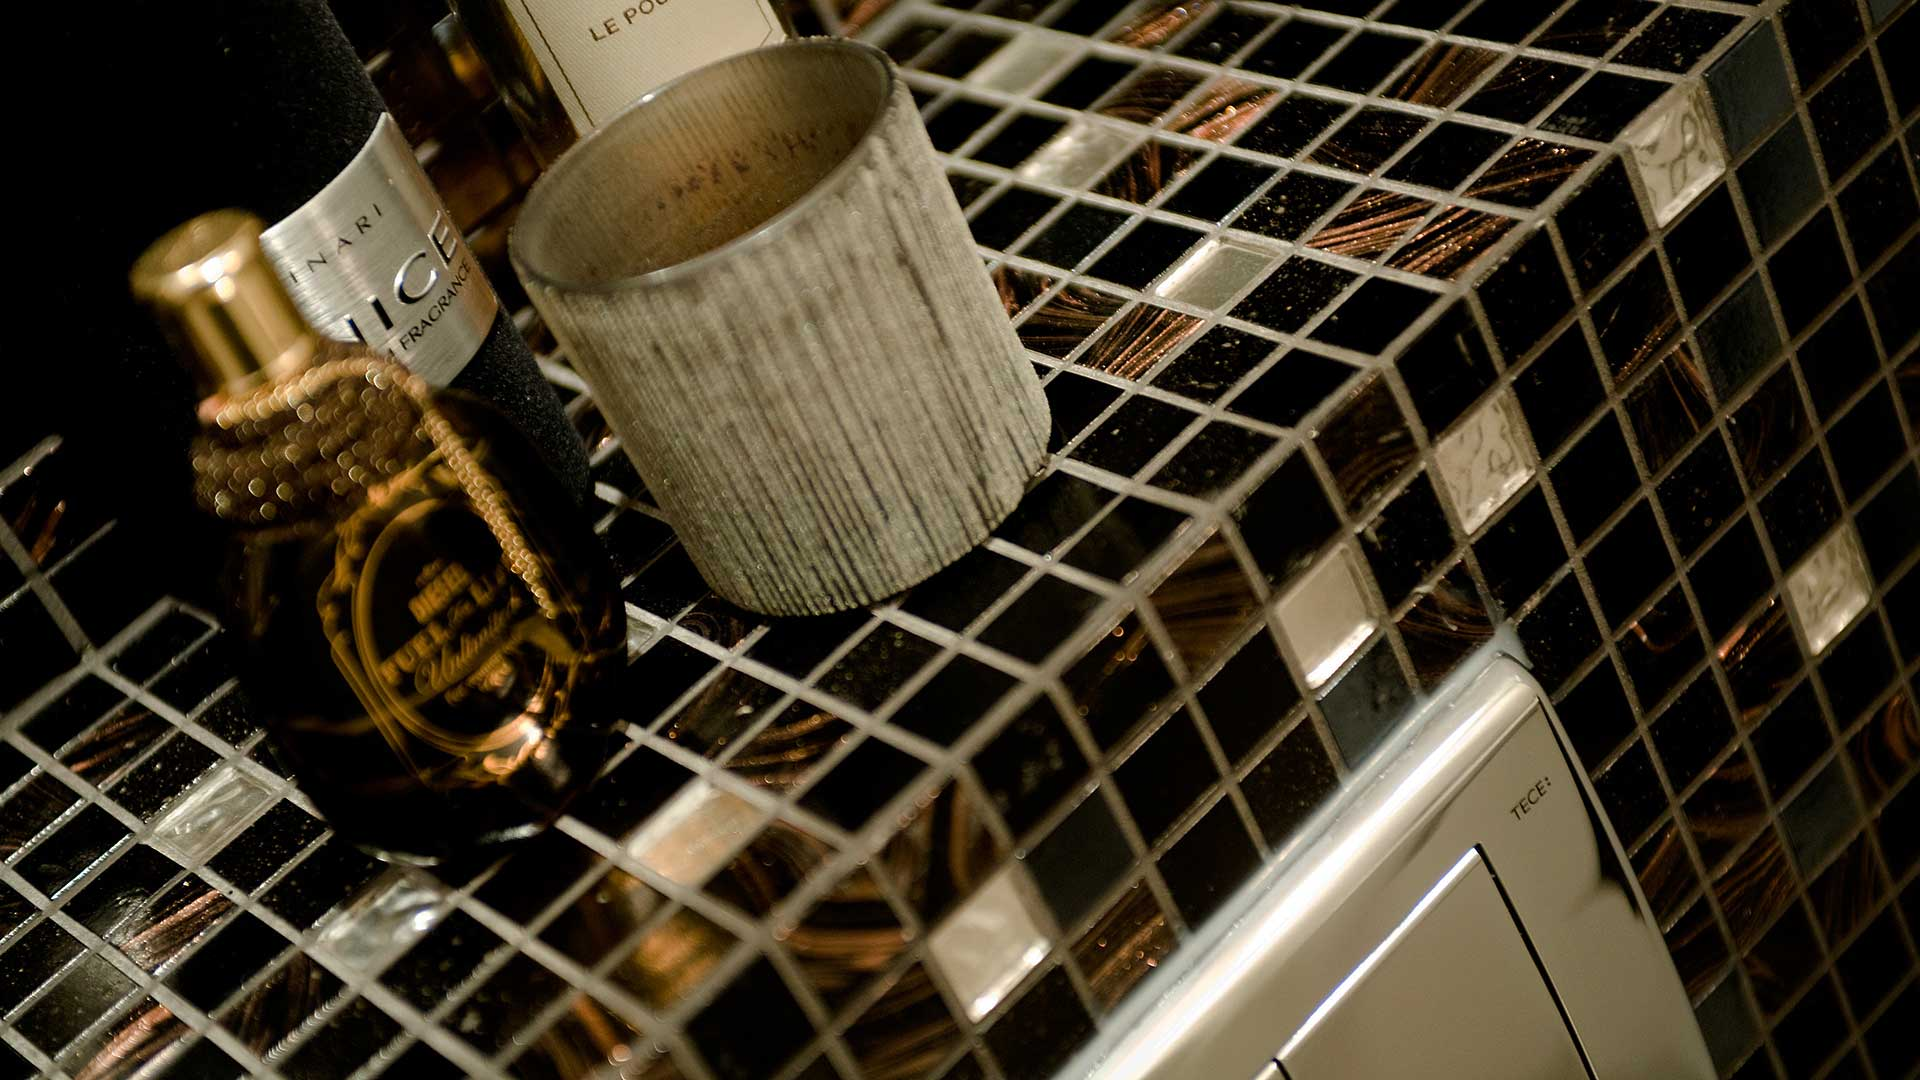 glasmozaiek tegels toilet bruin zwart goud